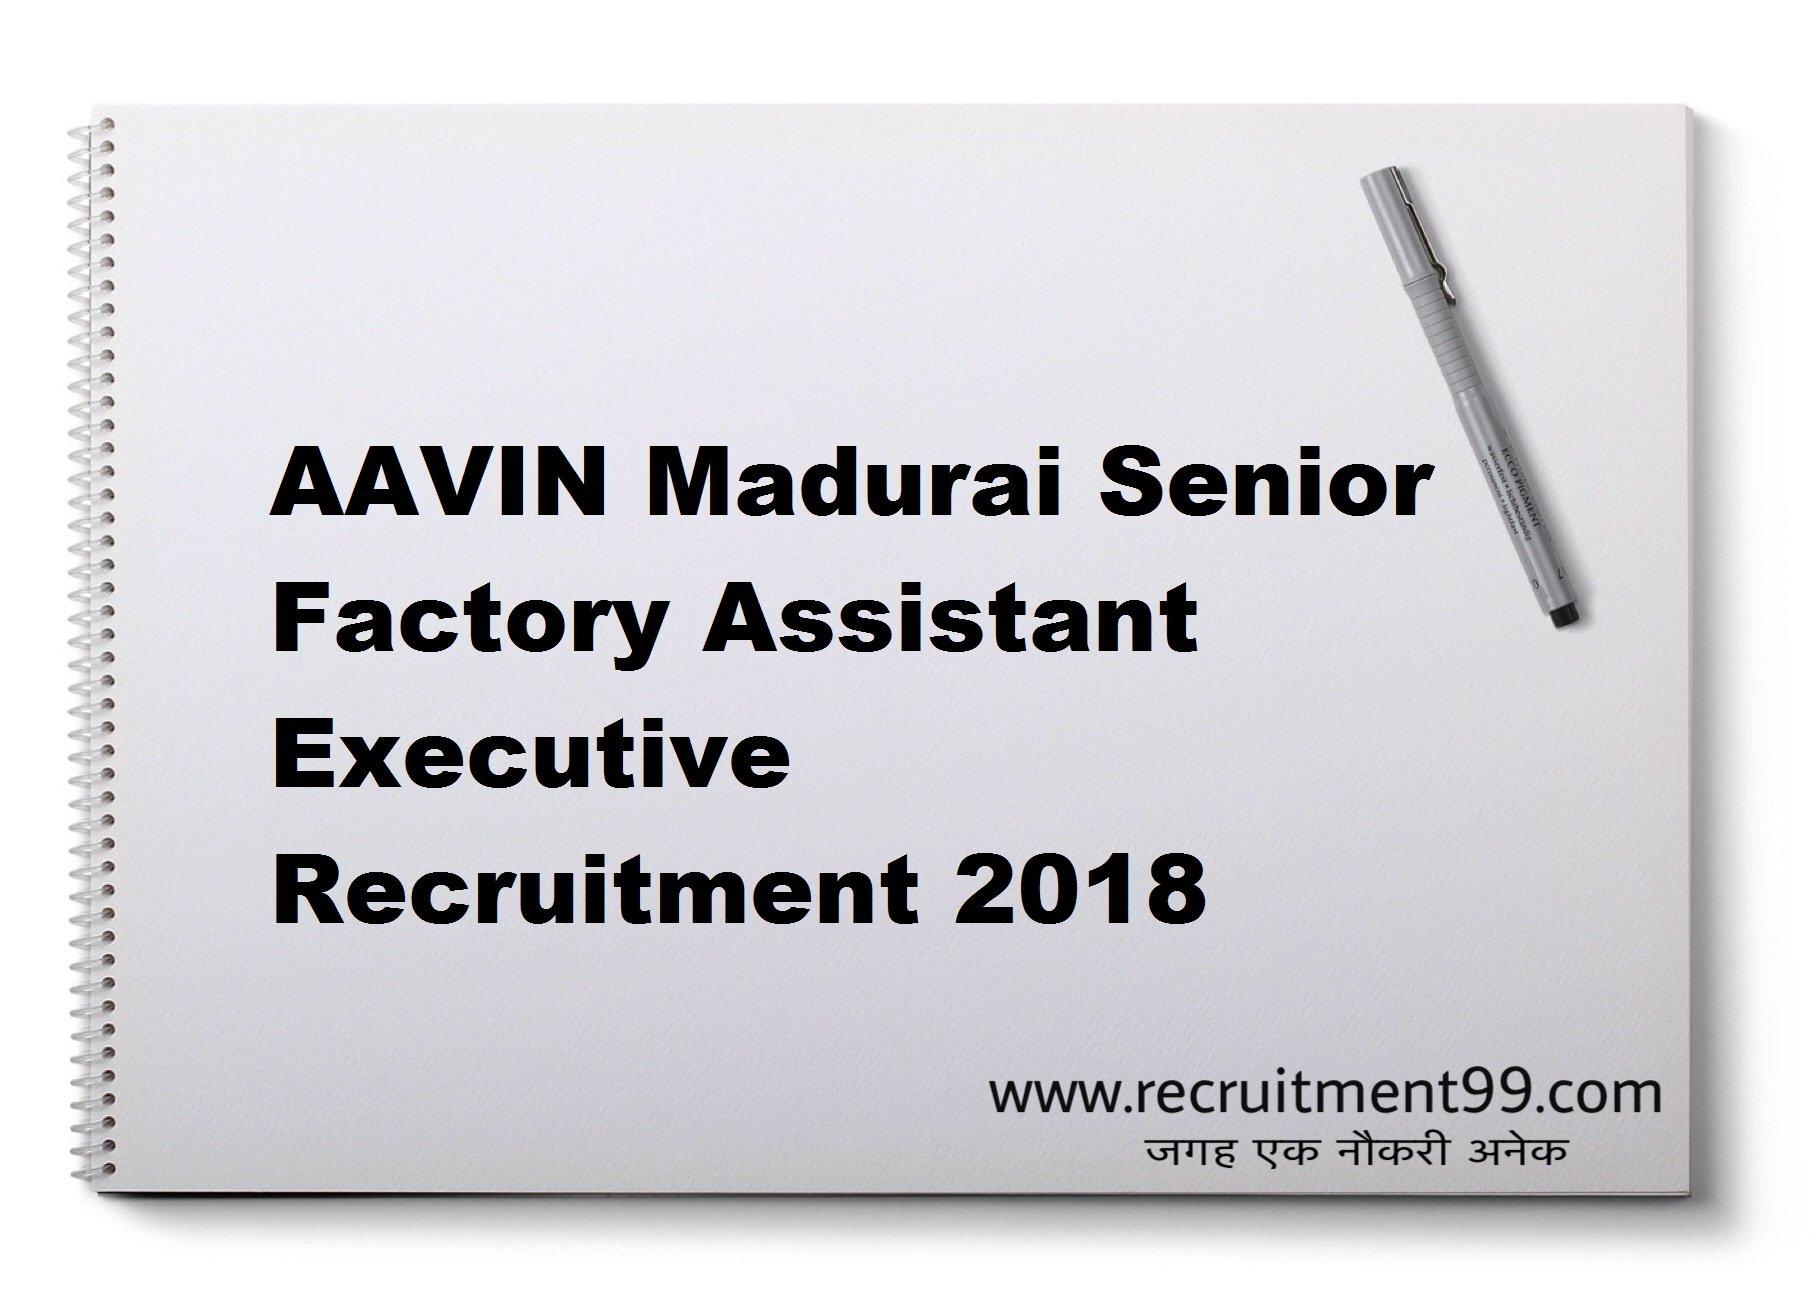 AAVIN Madurai Senior Factory Assistant Executive Recruitment Admit Card Result 2018